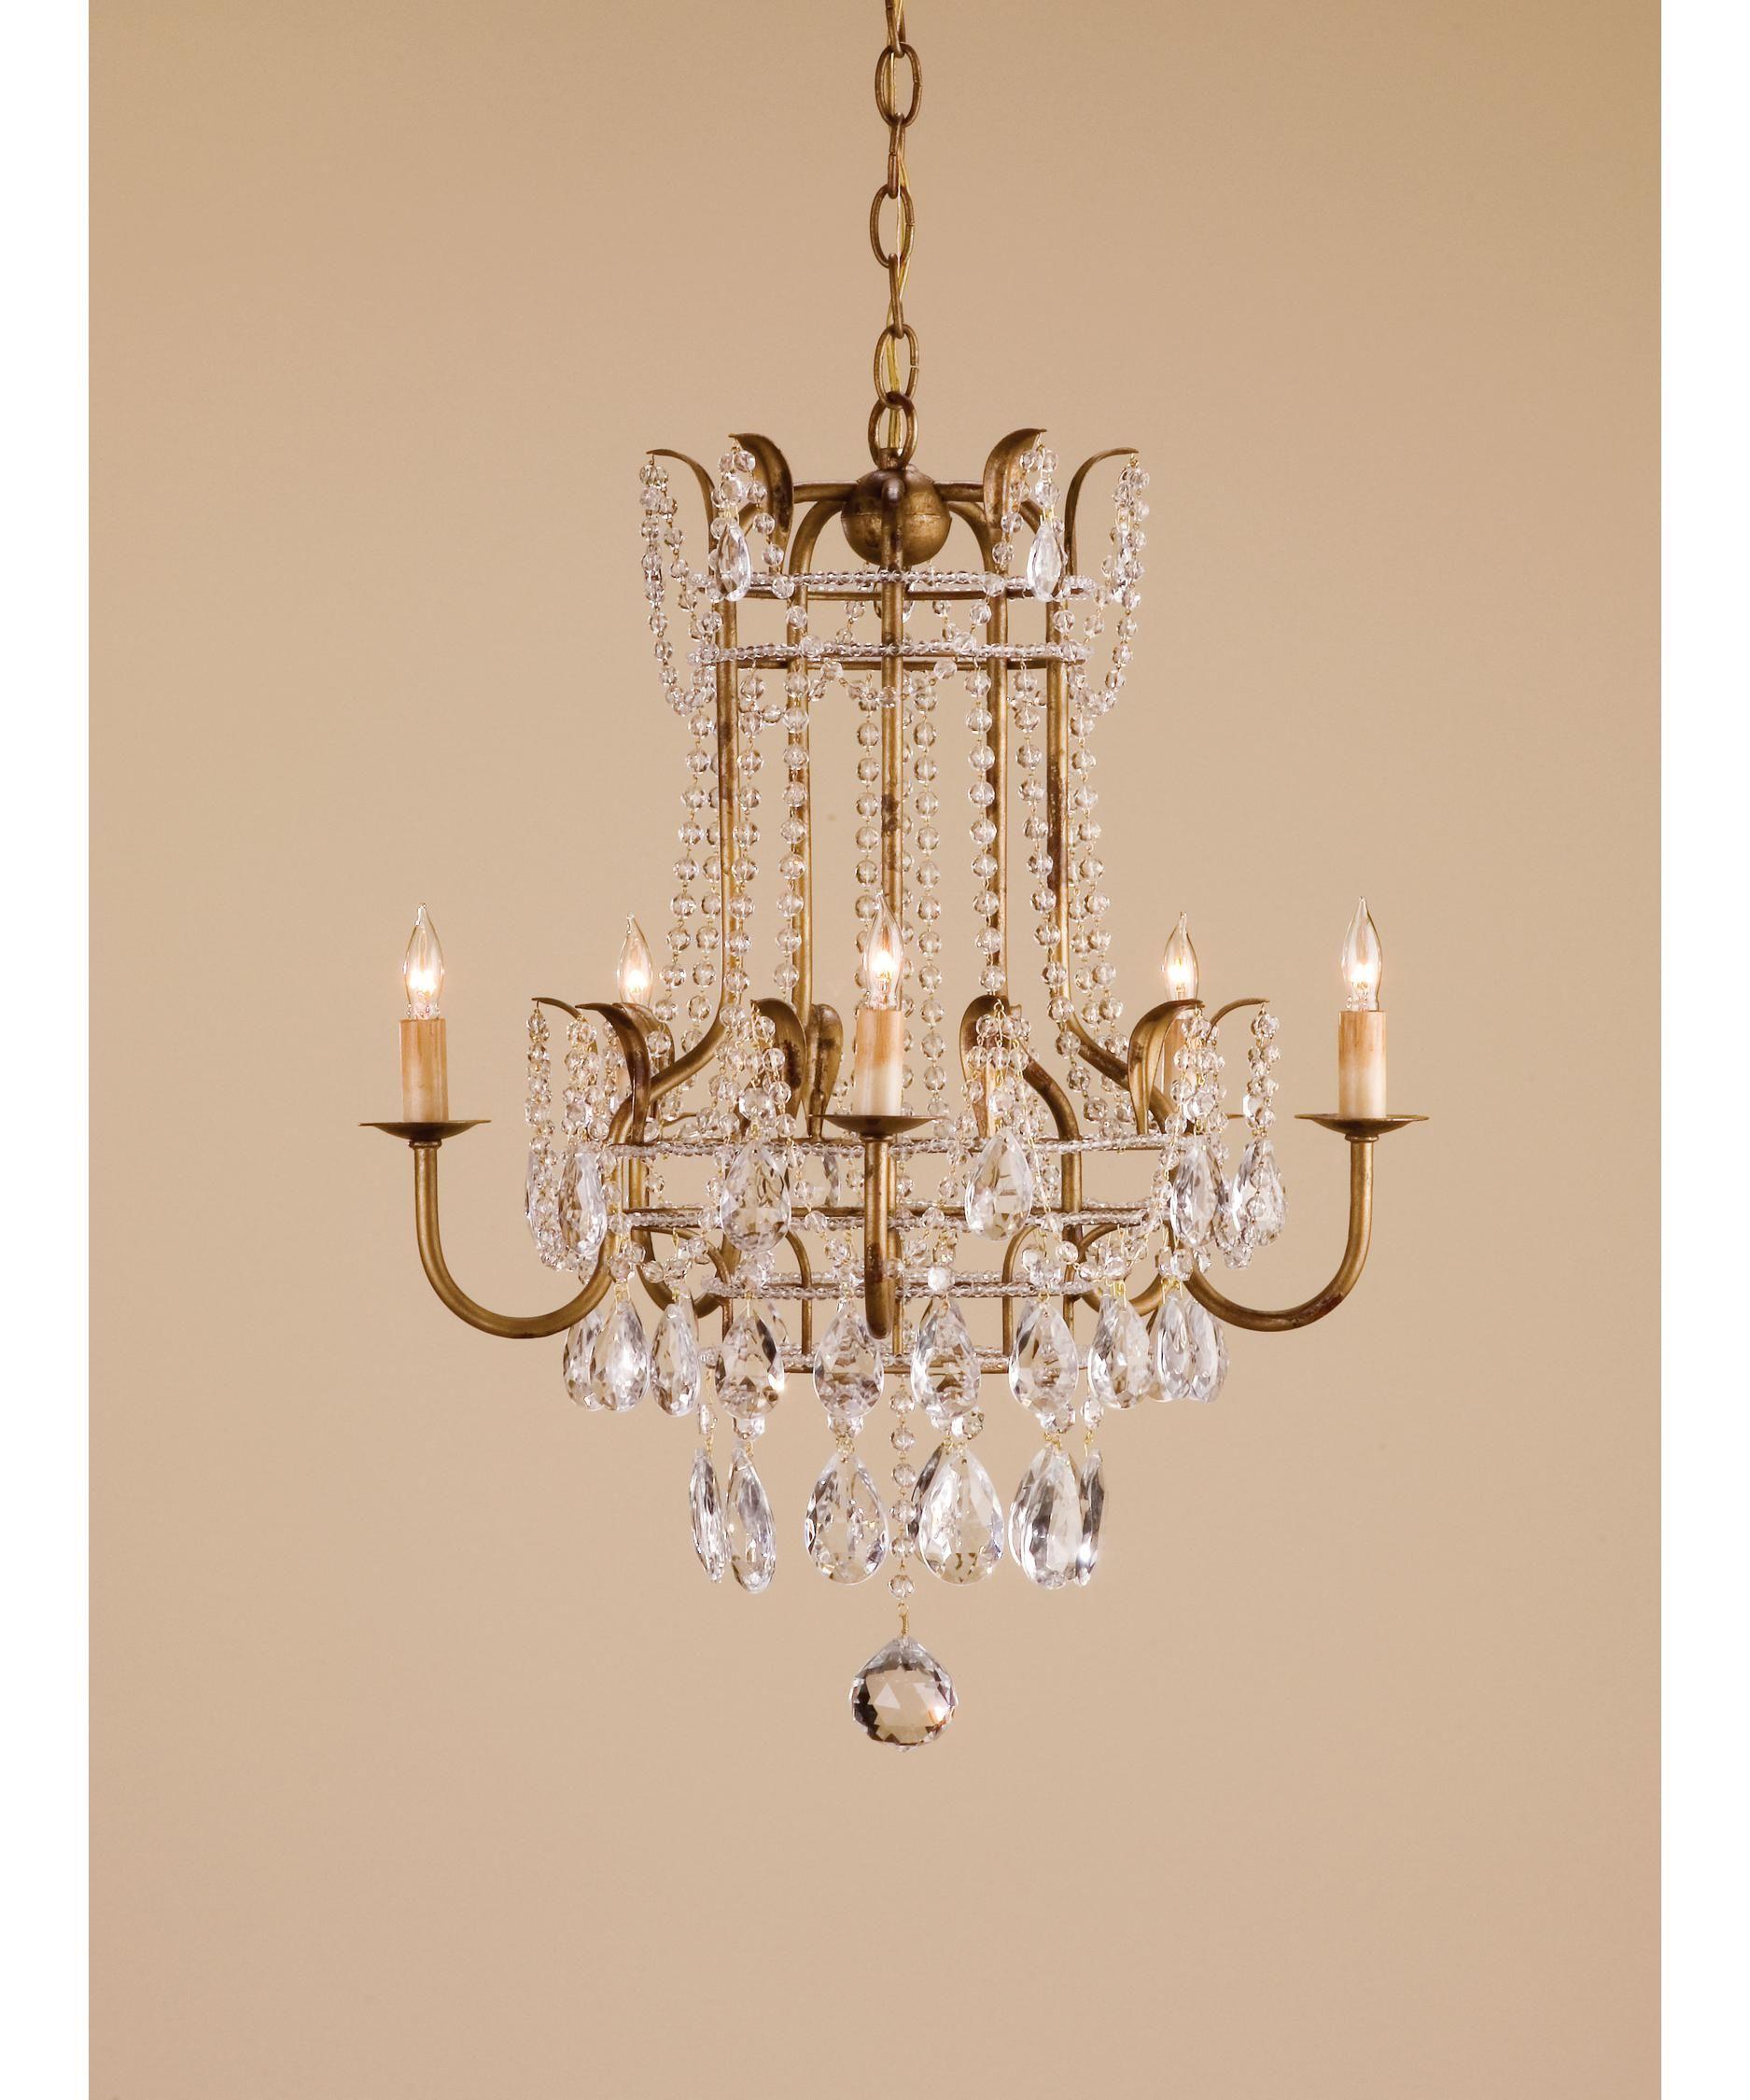 Shown in rhine gold finish laurel lighting pinterest mini